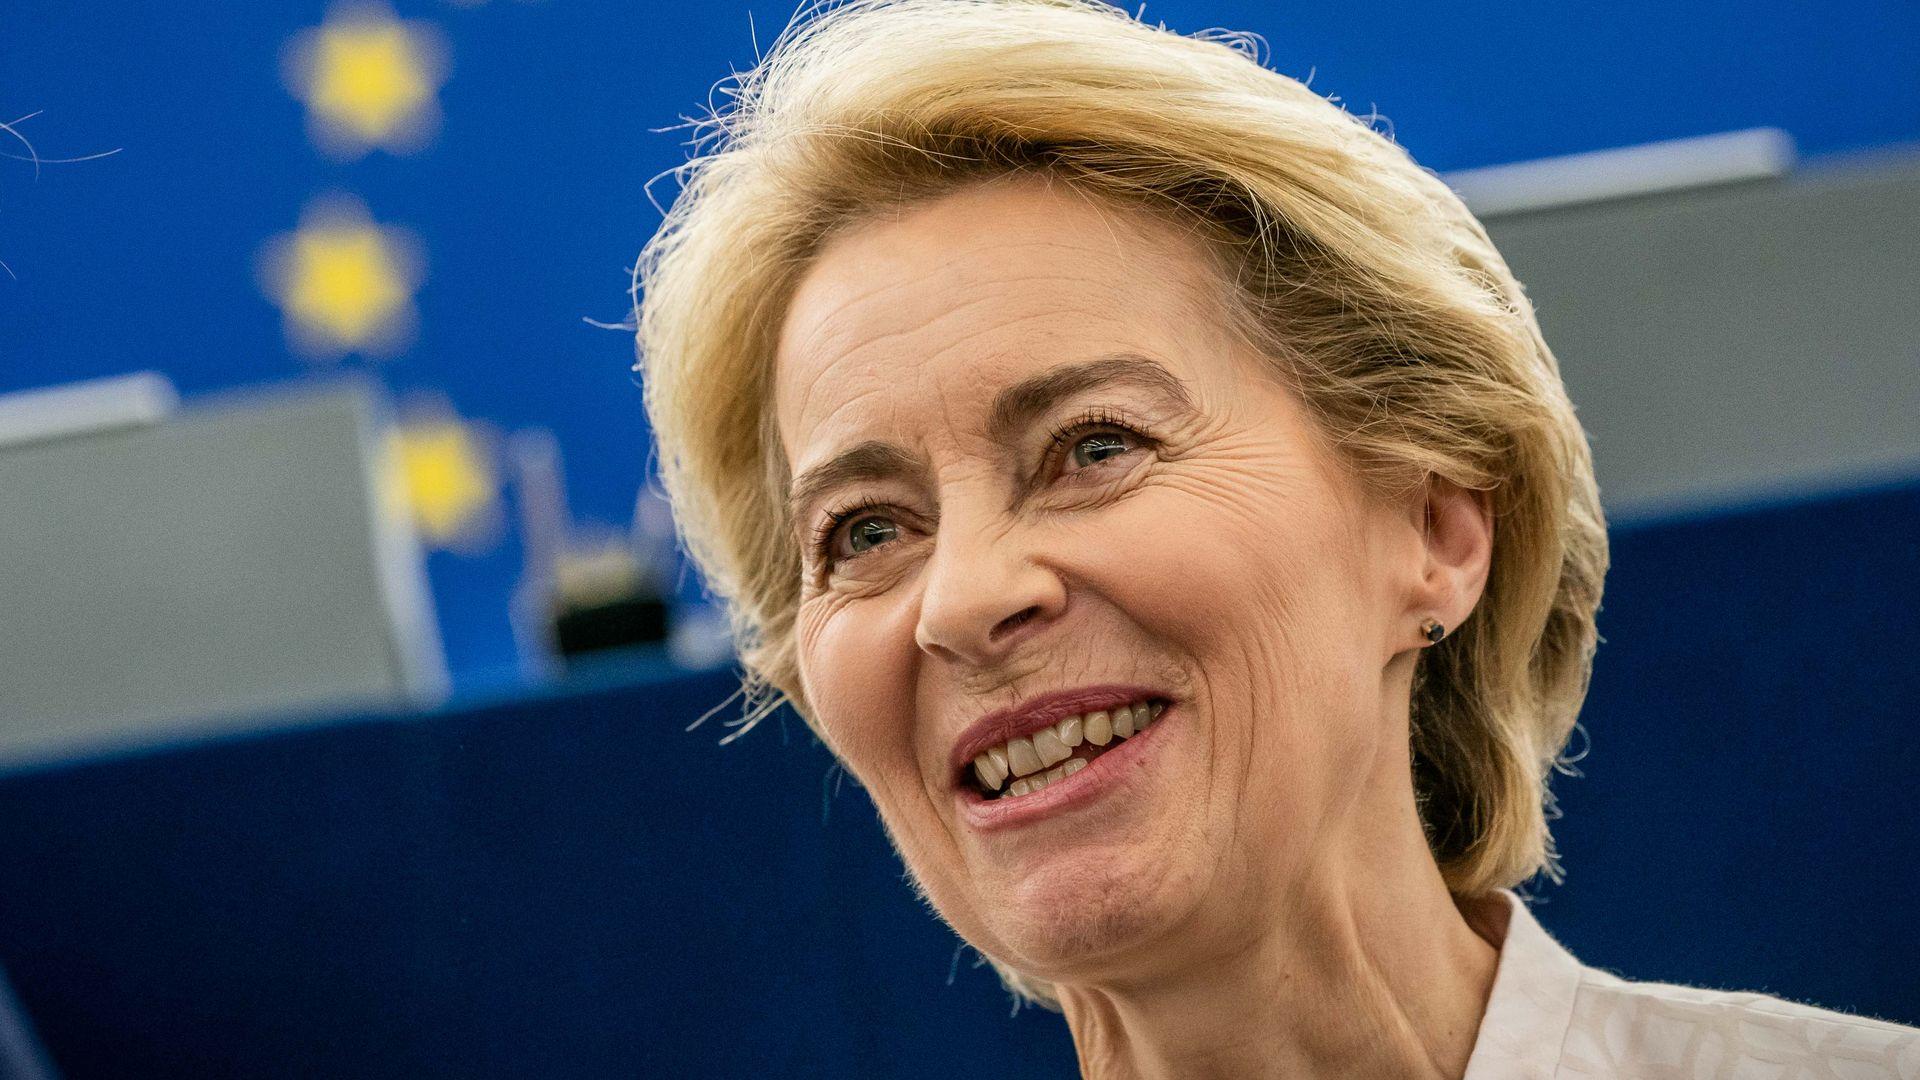 Ursula Von der Leyen narrowly approved to lead European Commission